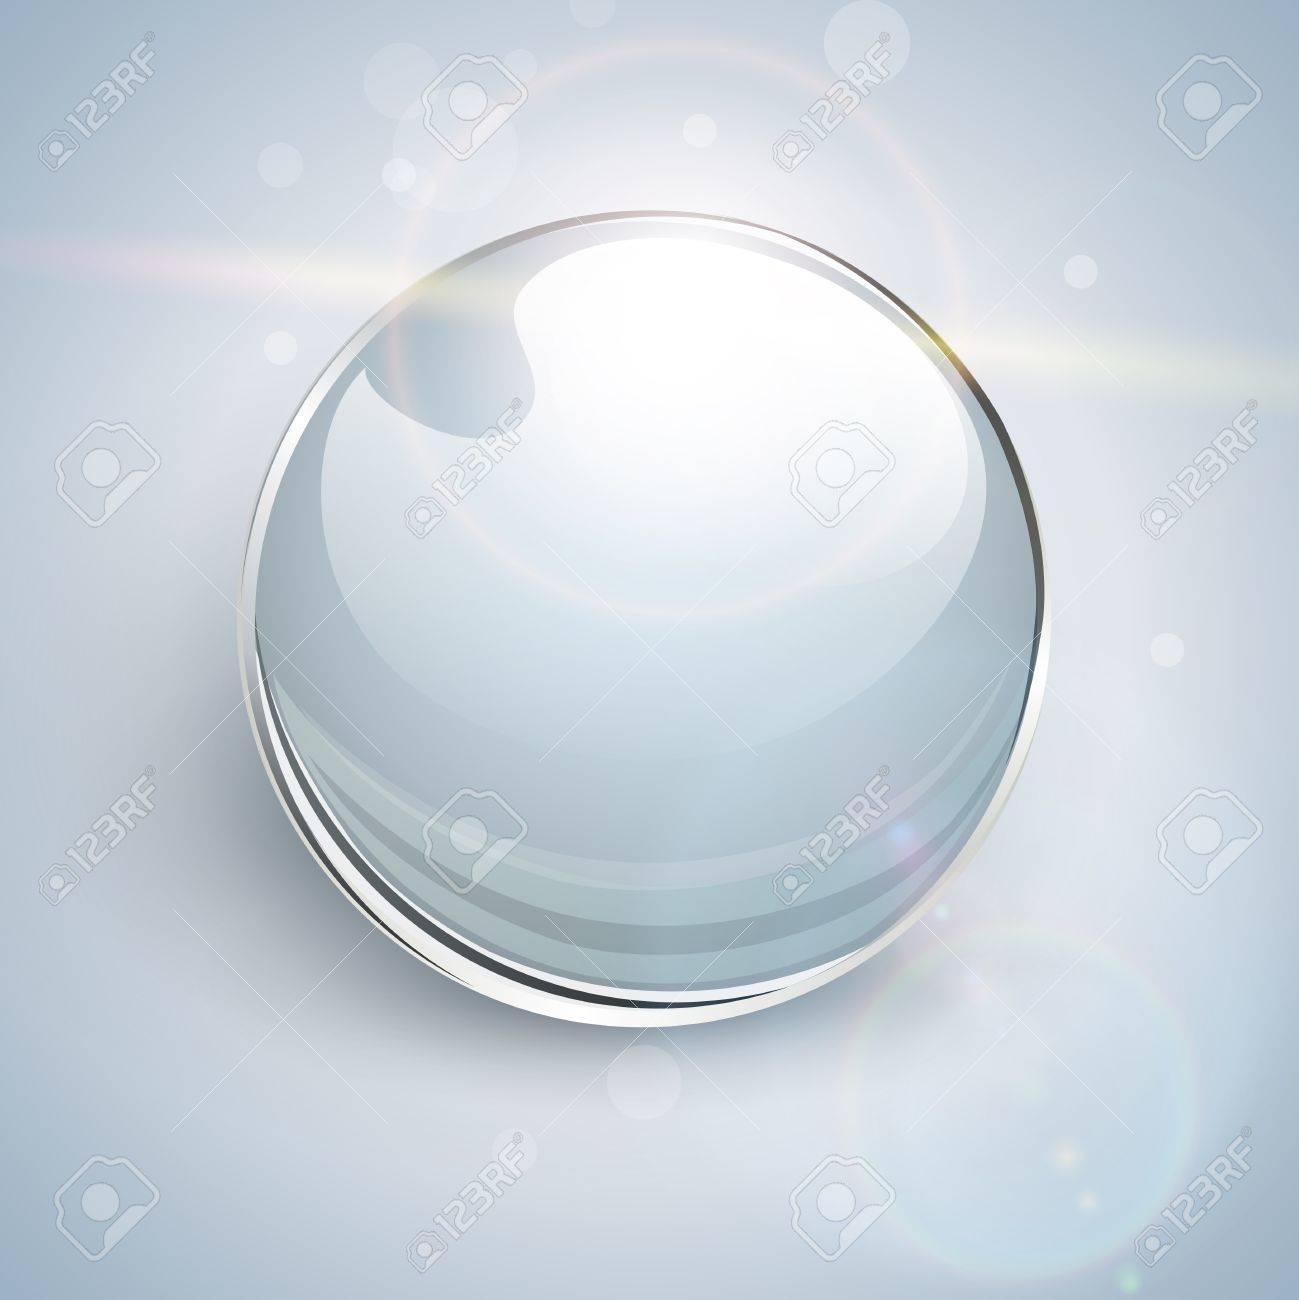 Shiny glass ball background. Stock Vector - 20950947